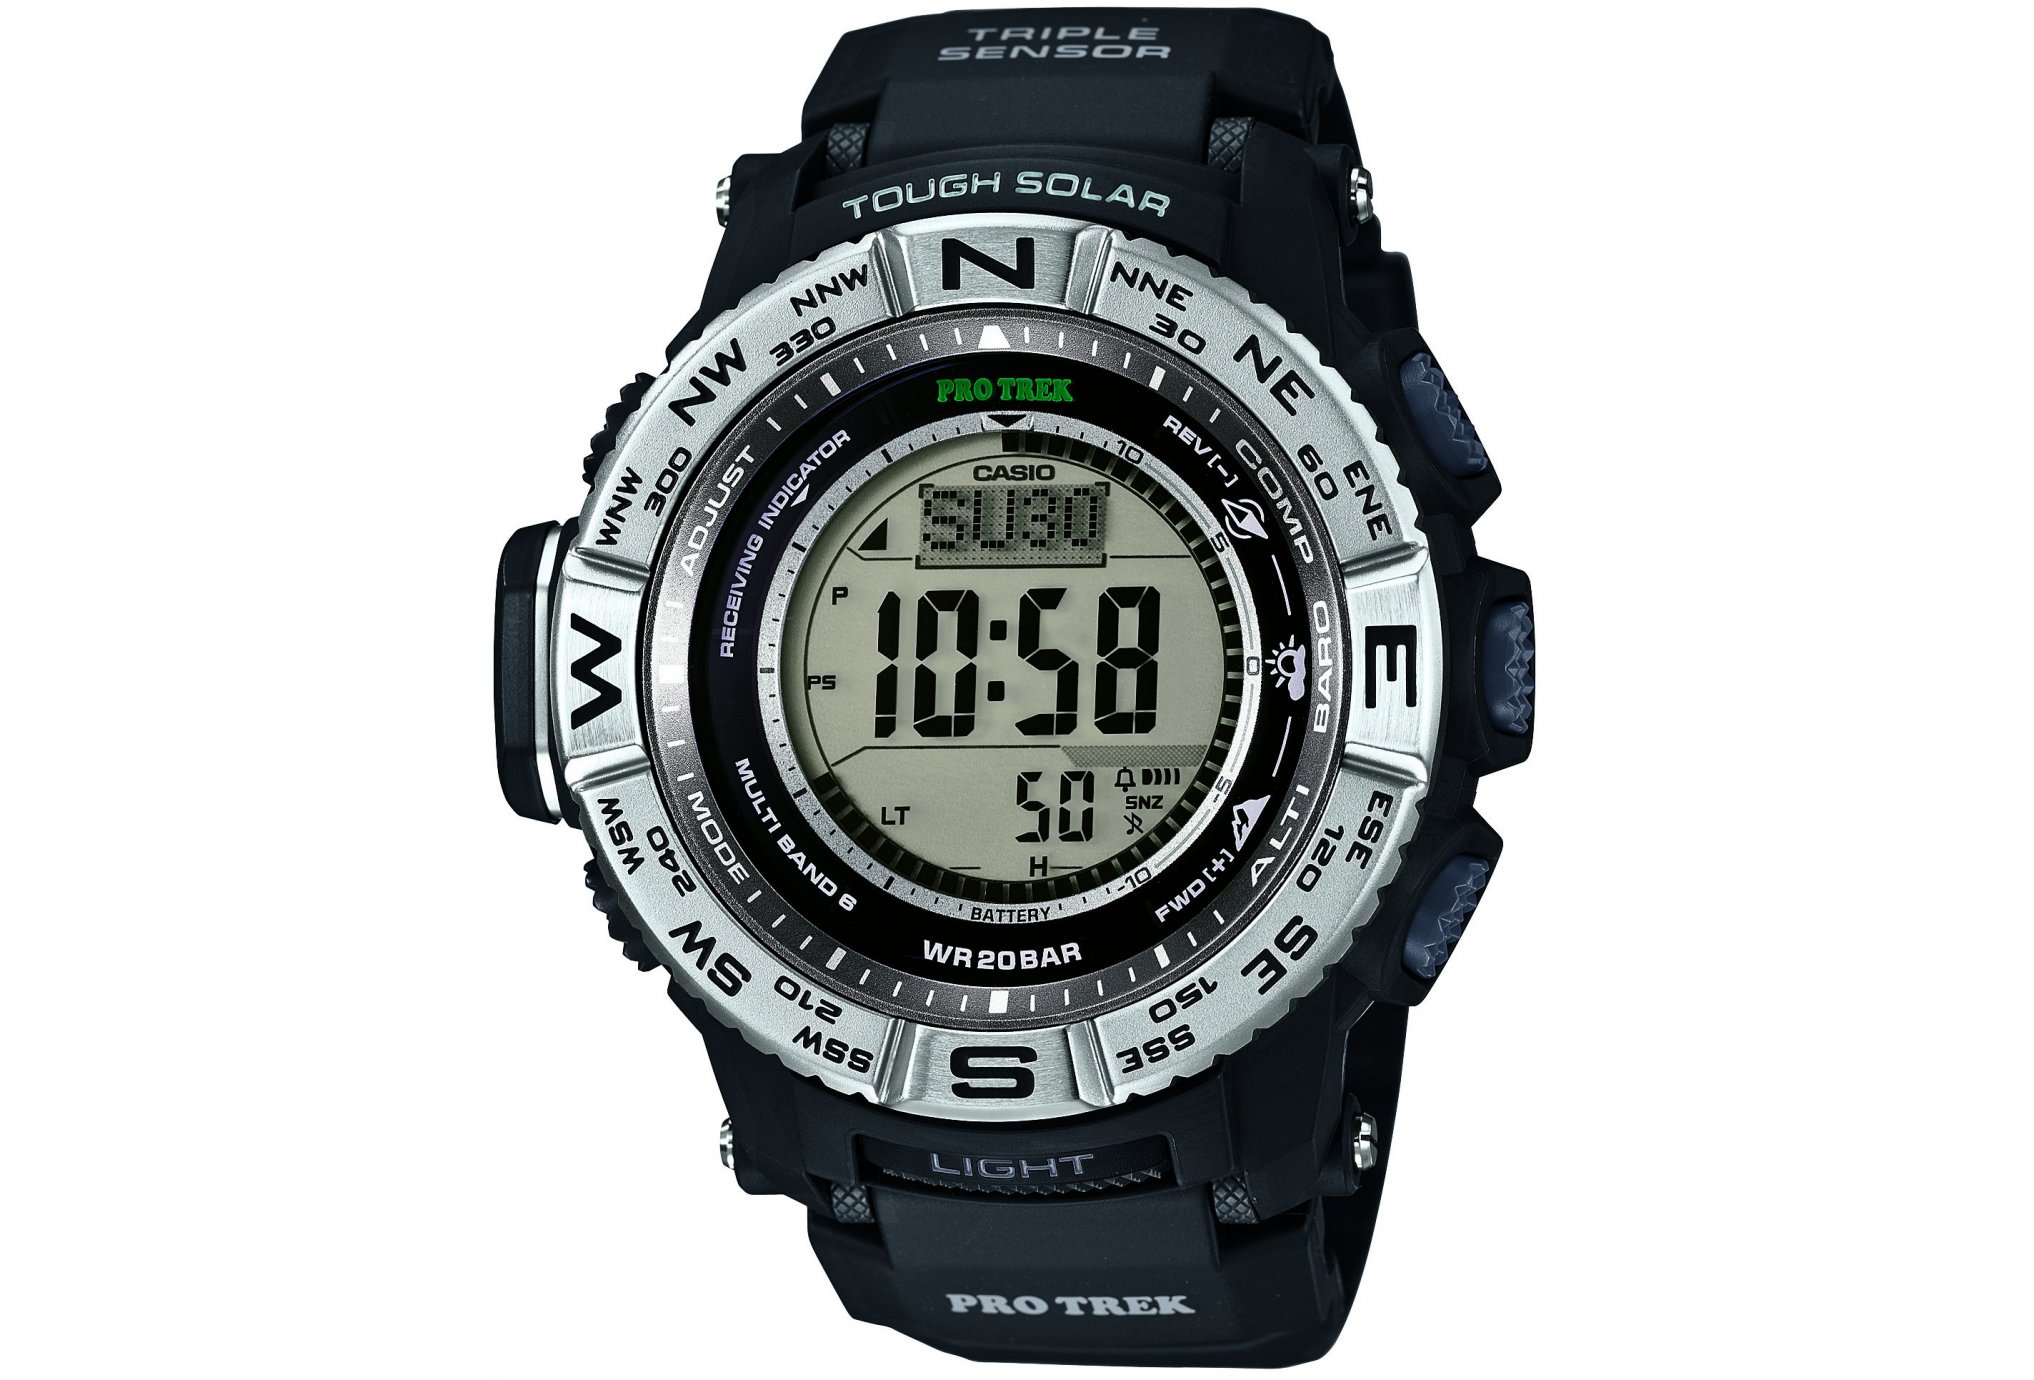 Casio Pro trek prw-3500 montres de sport